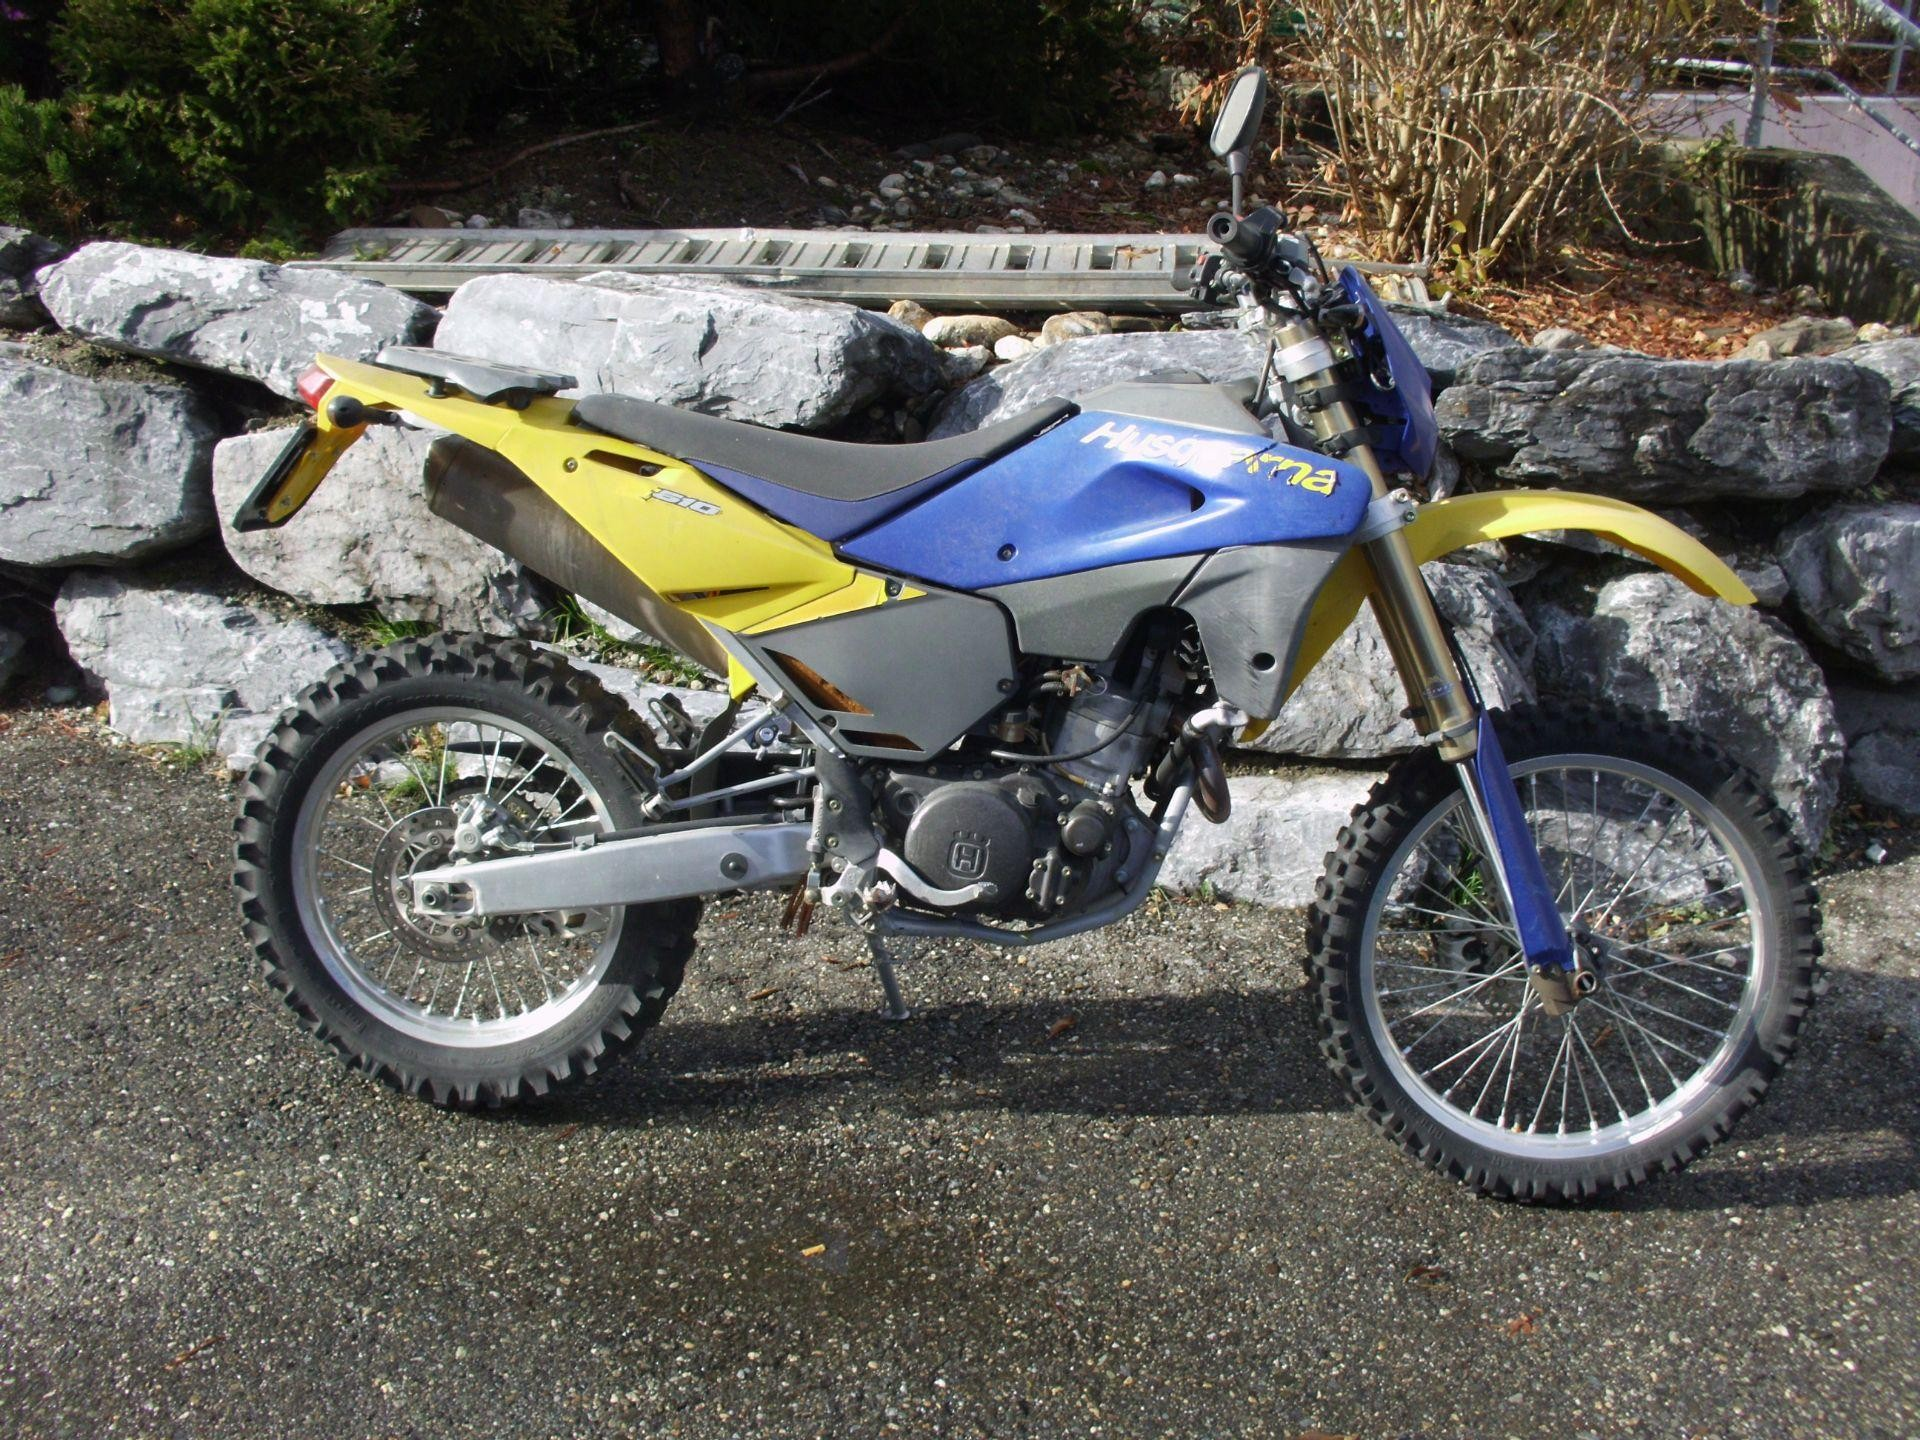 Moto occasions acheter husqvarna 610 l garage allenspach ilanz for Garage moto occasion